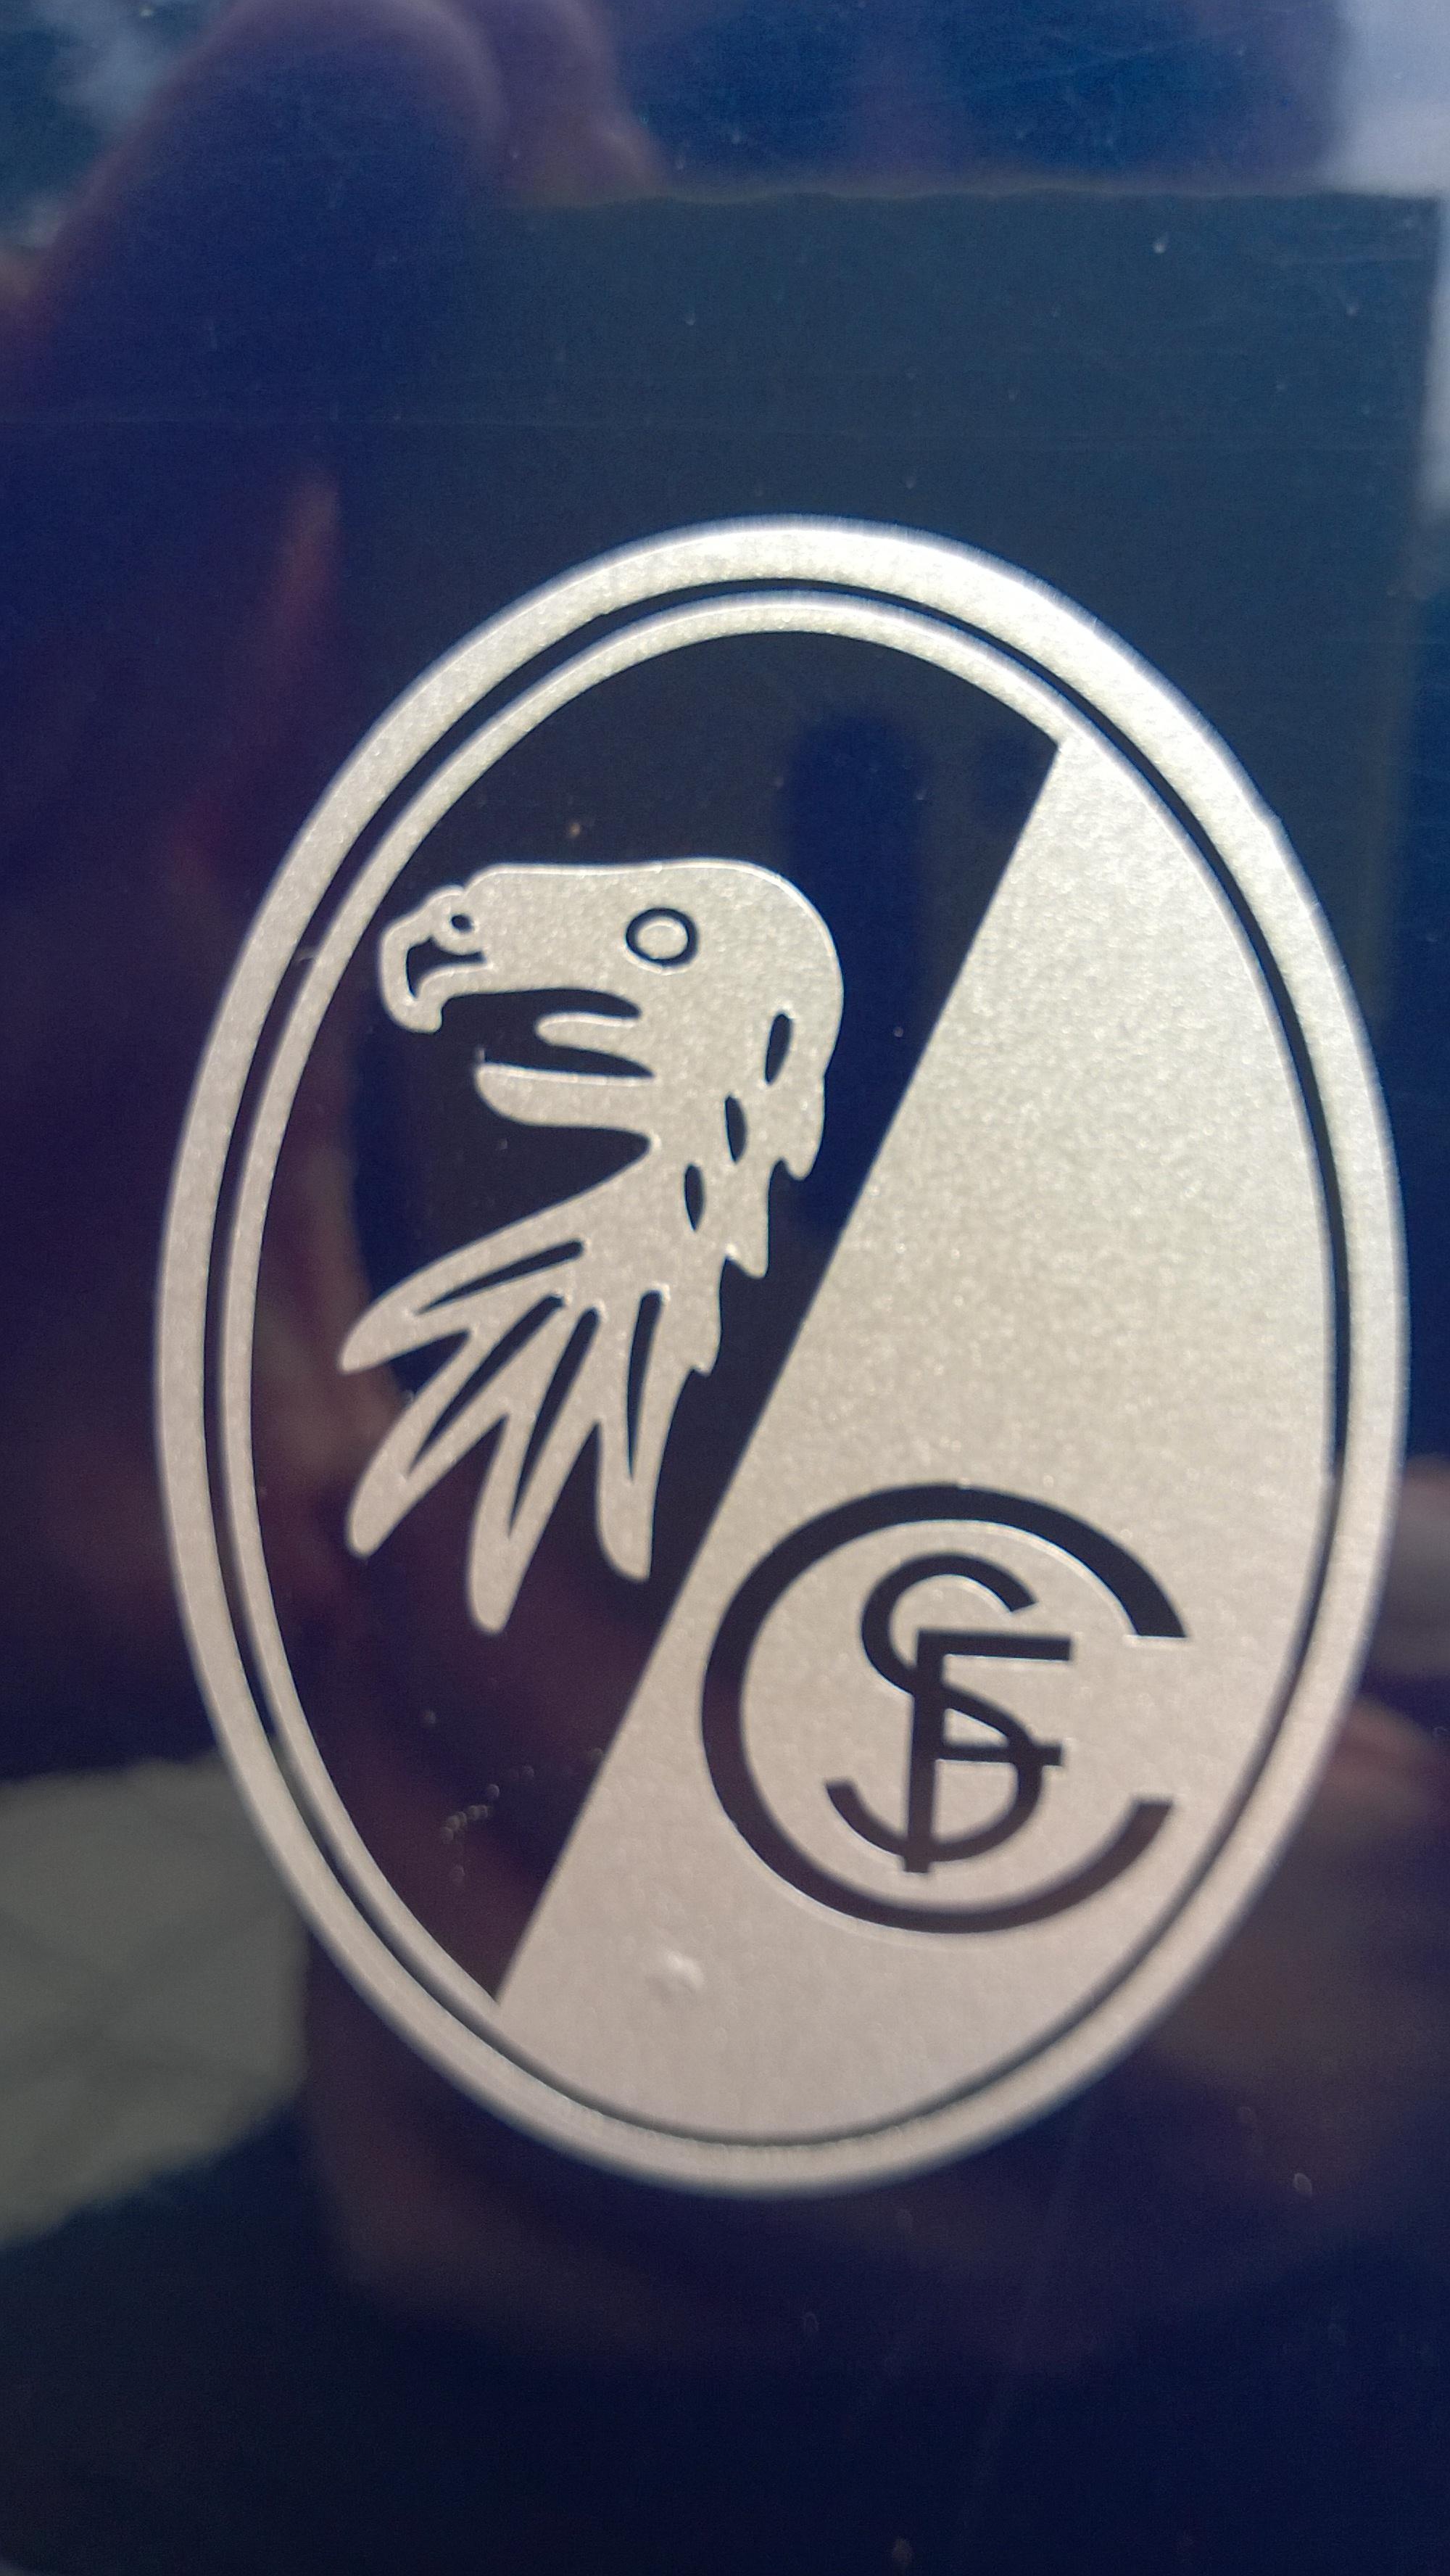 sc freiburg transfer